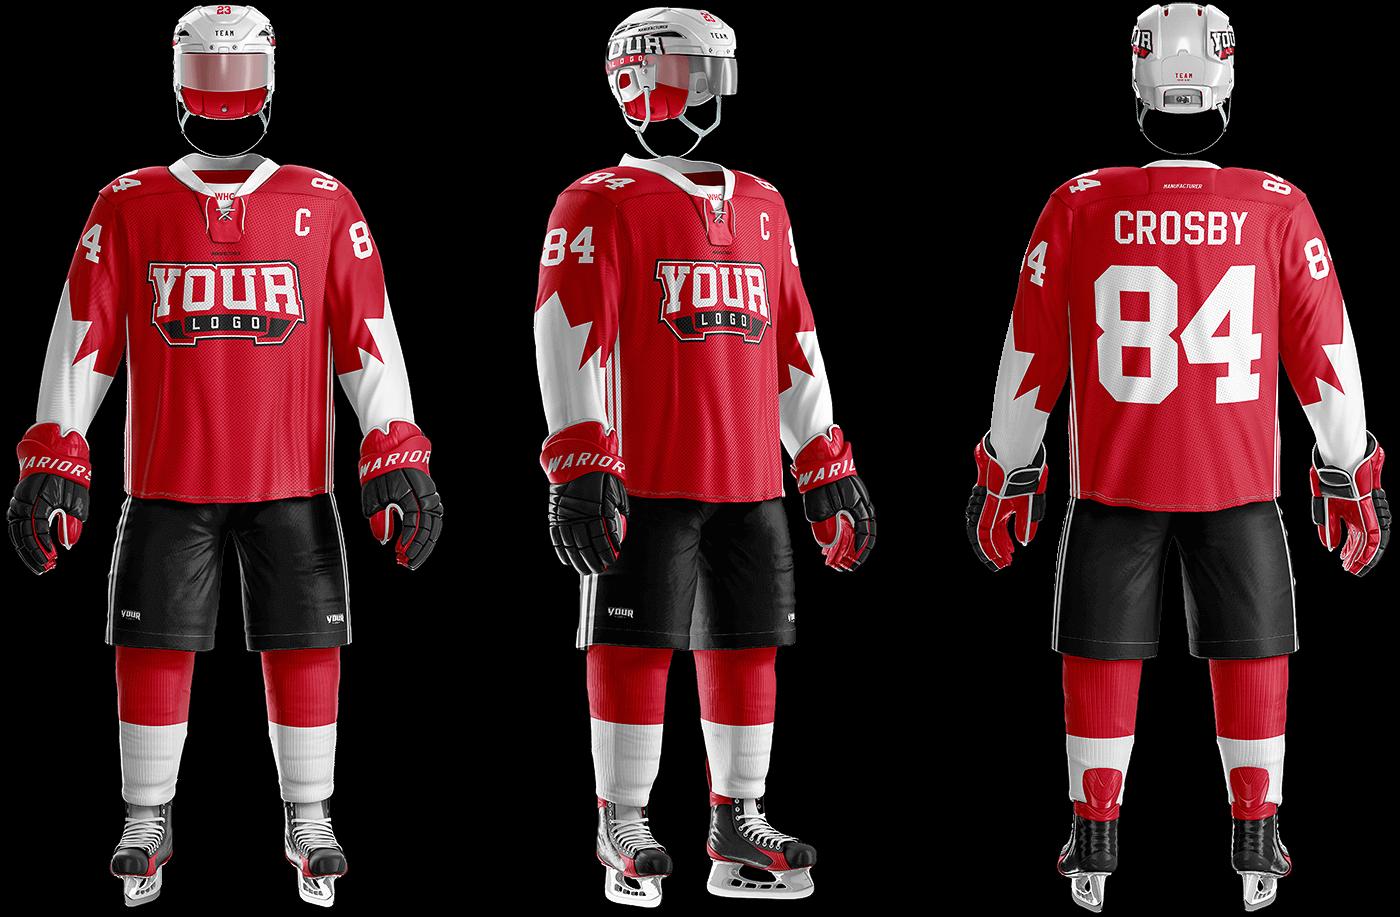 Ice Hockey Uniform Template on Behance